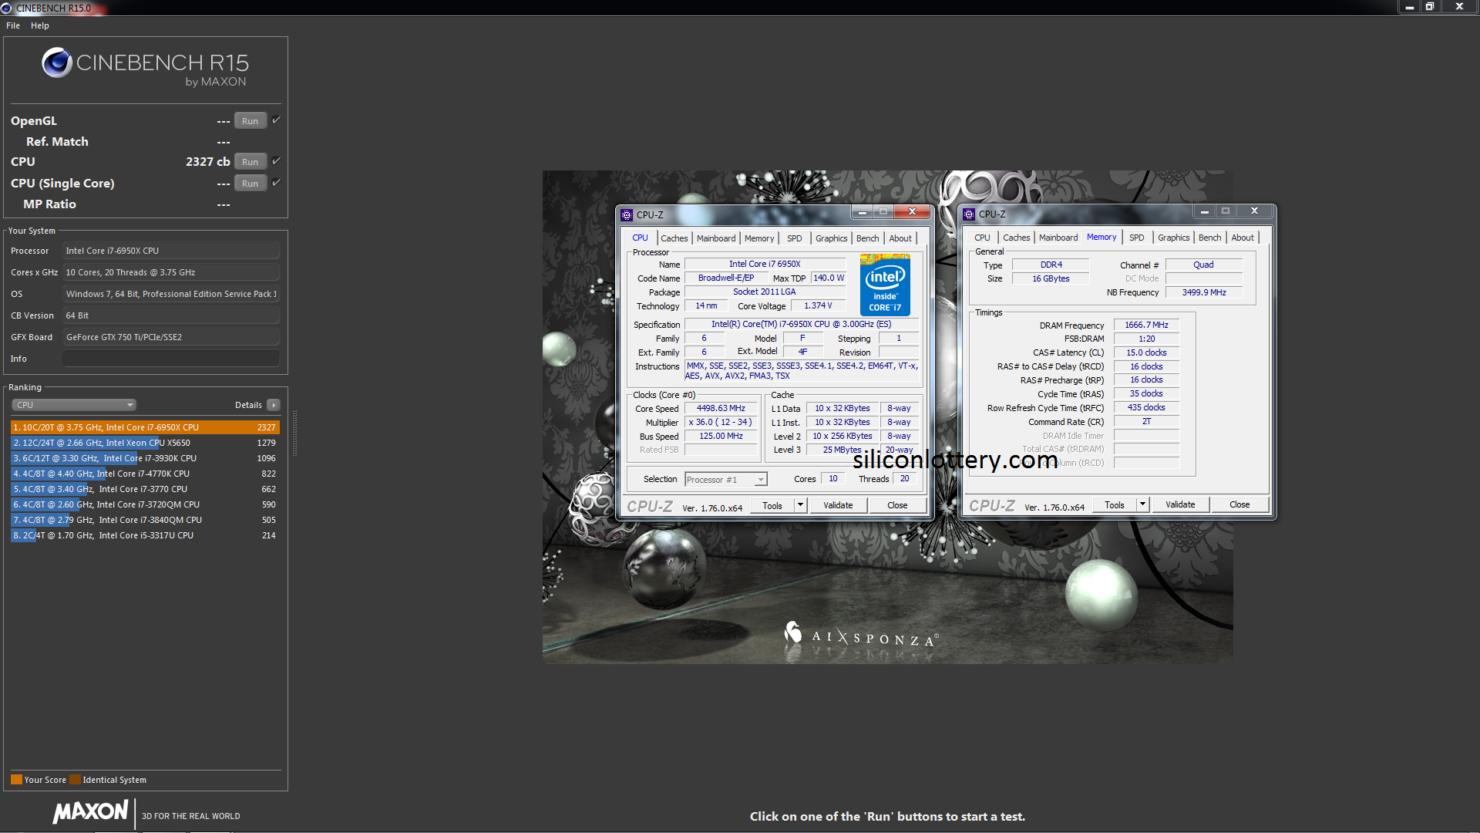 intel-core-i7-6950x-vs-core-i7-5960x_cinebench_4-5-ghz_2